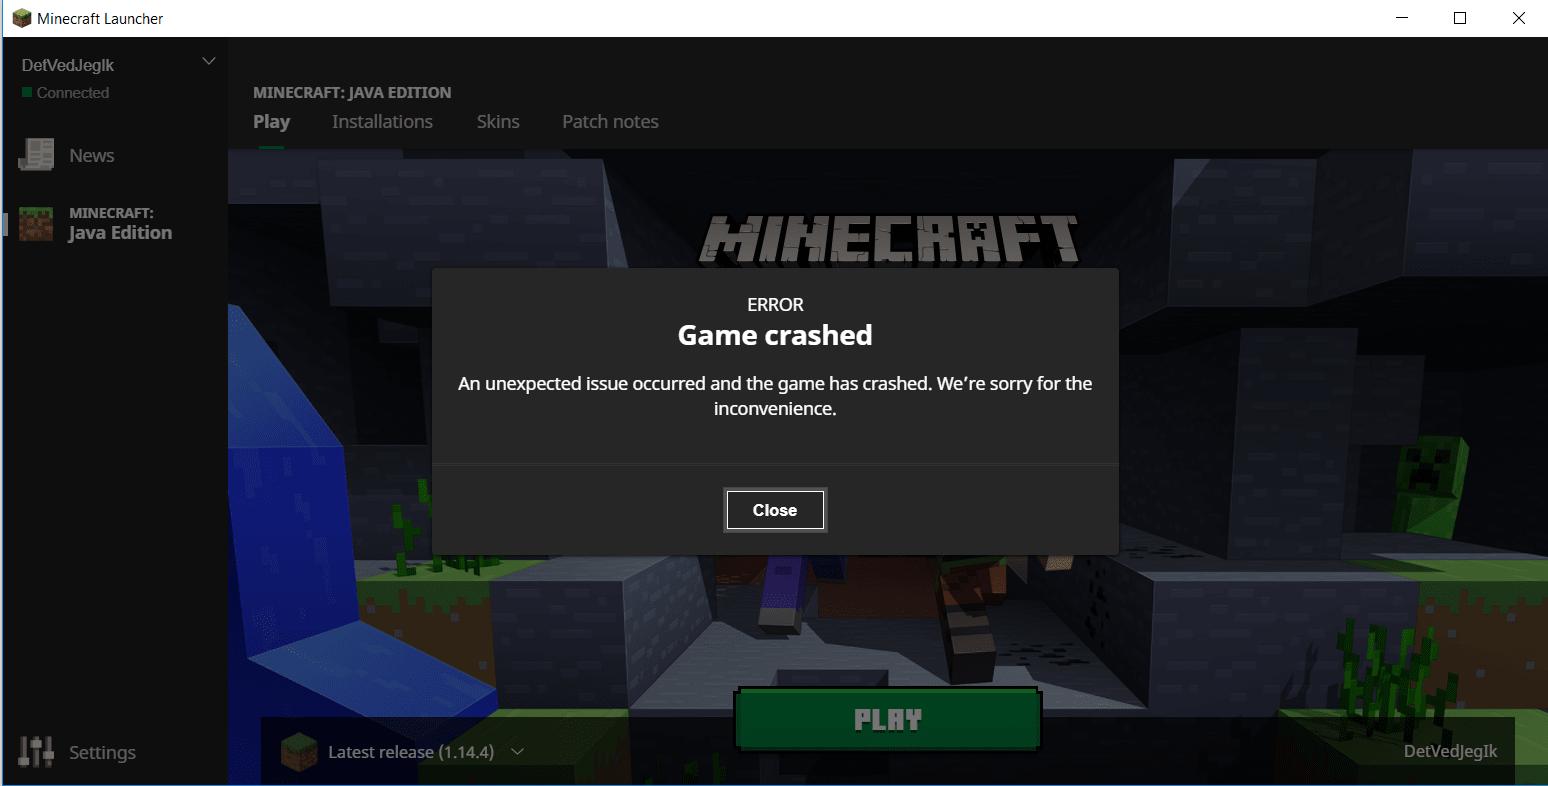 minecraft keep crashing, here is fix